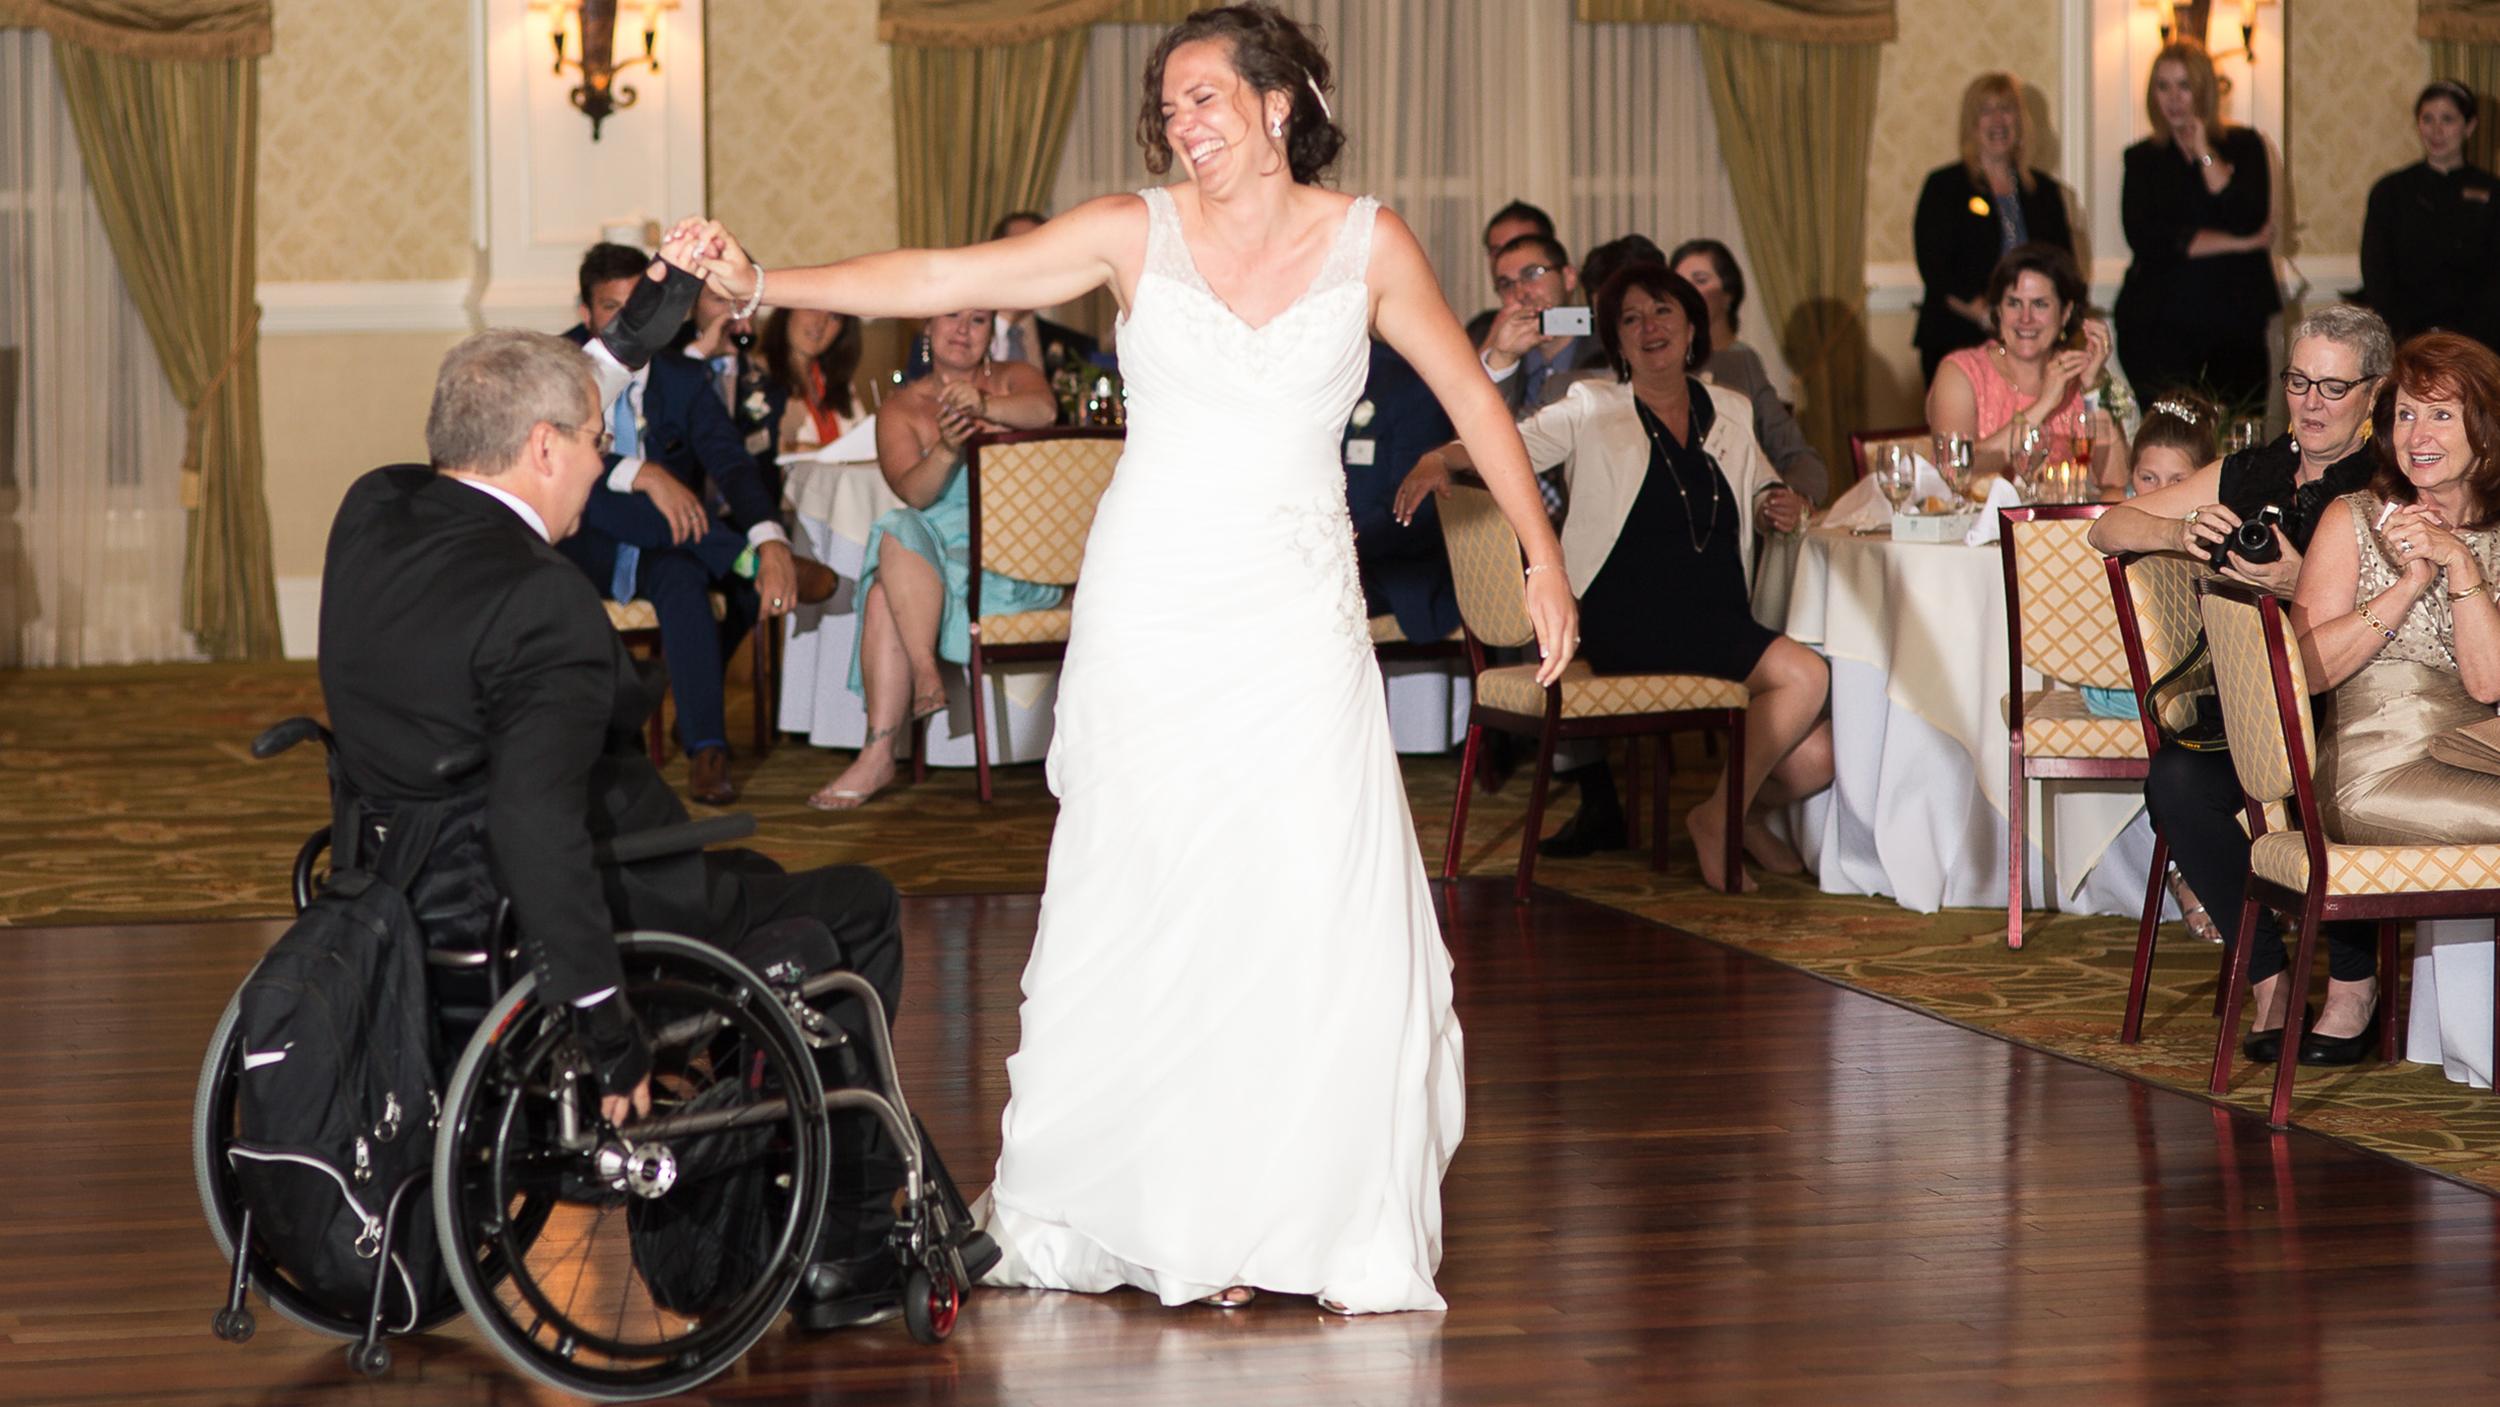 Quadriplegic Dad Dances After 17 Years At Daughters Wedding